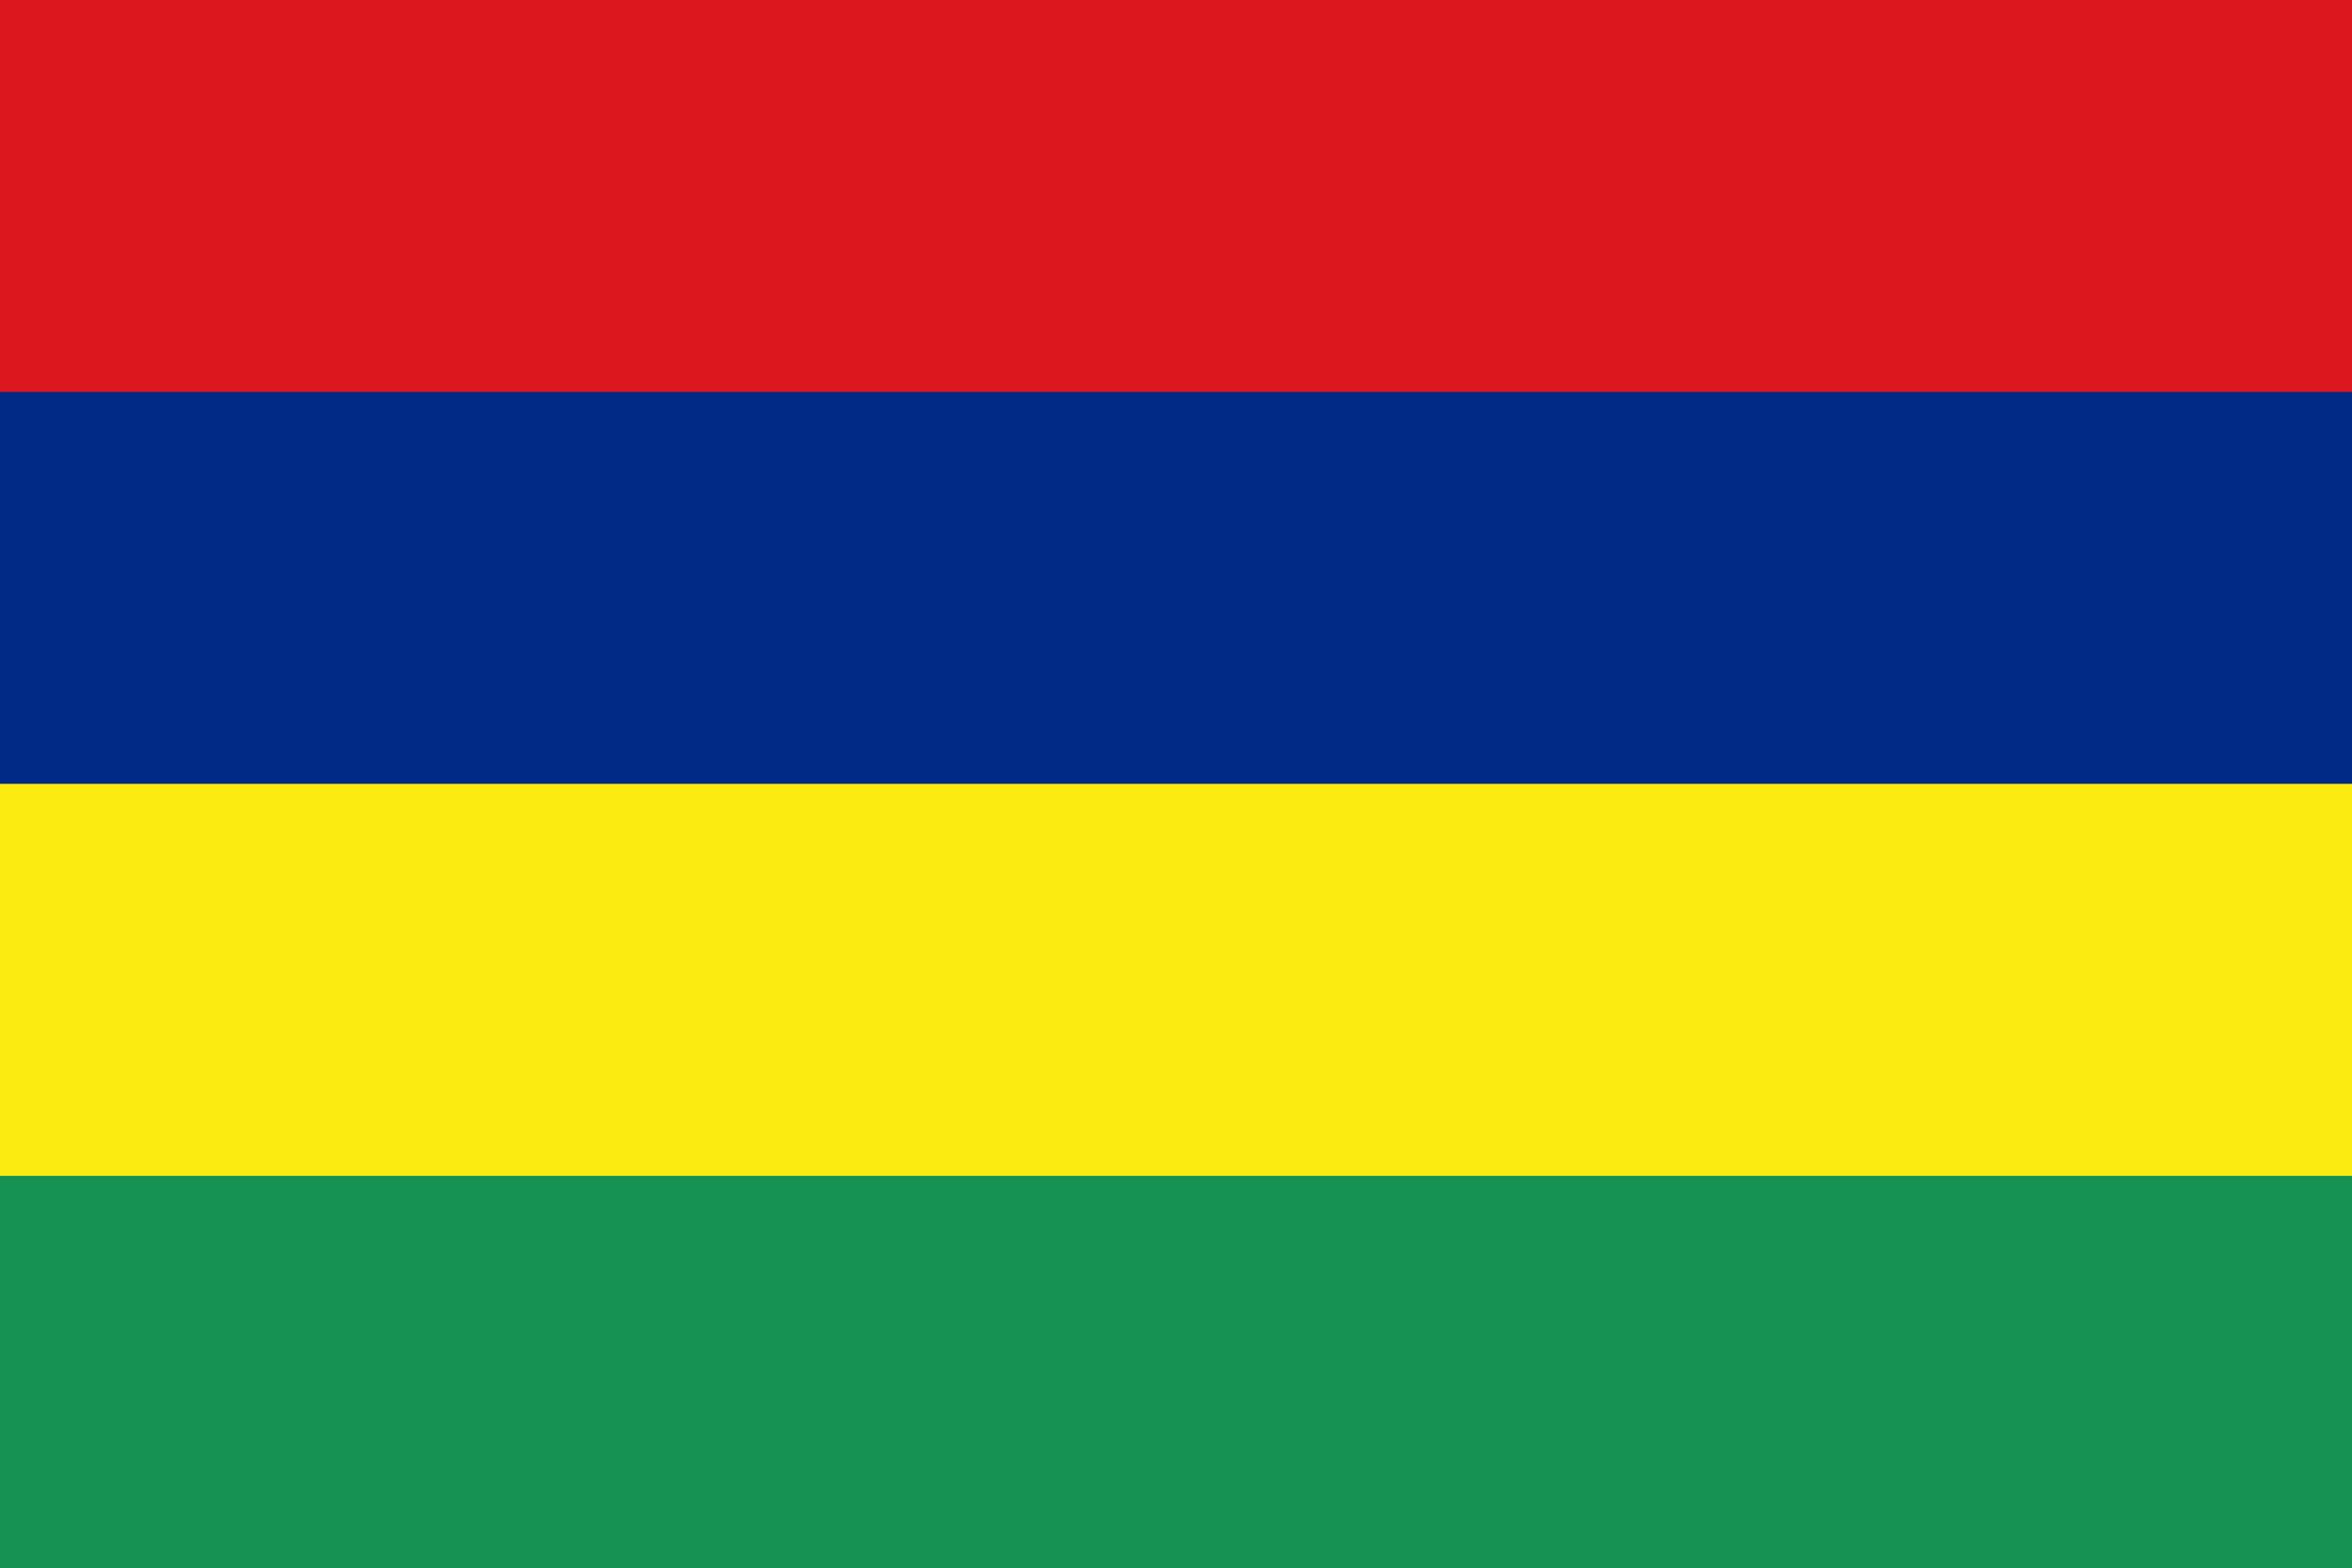 mauricio, χώρα, έμβλημα, λογότυπο, σύμβολο - Wallpapers HD - Professor-falken.com